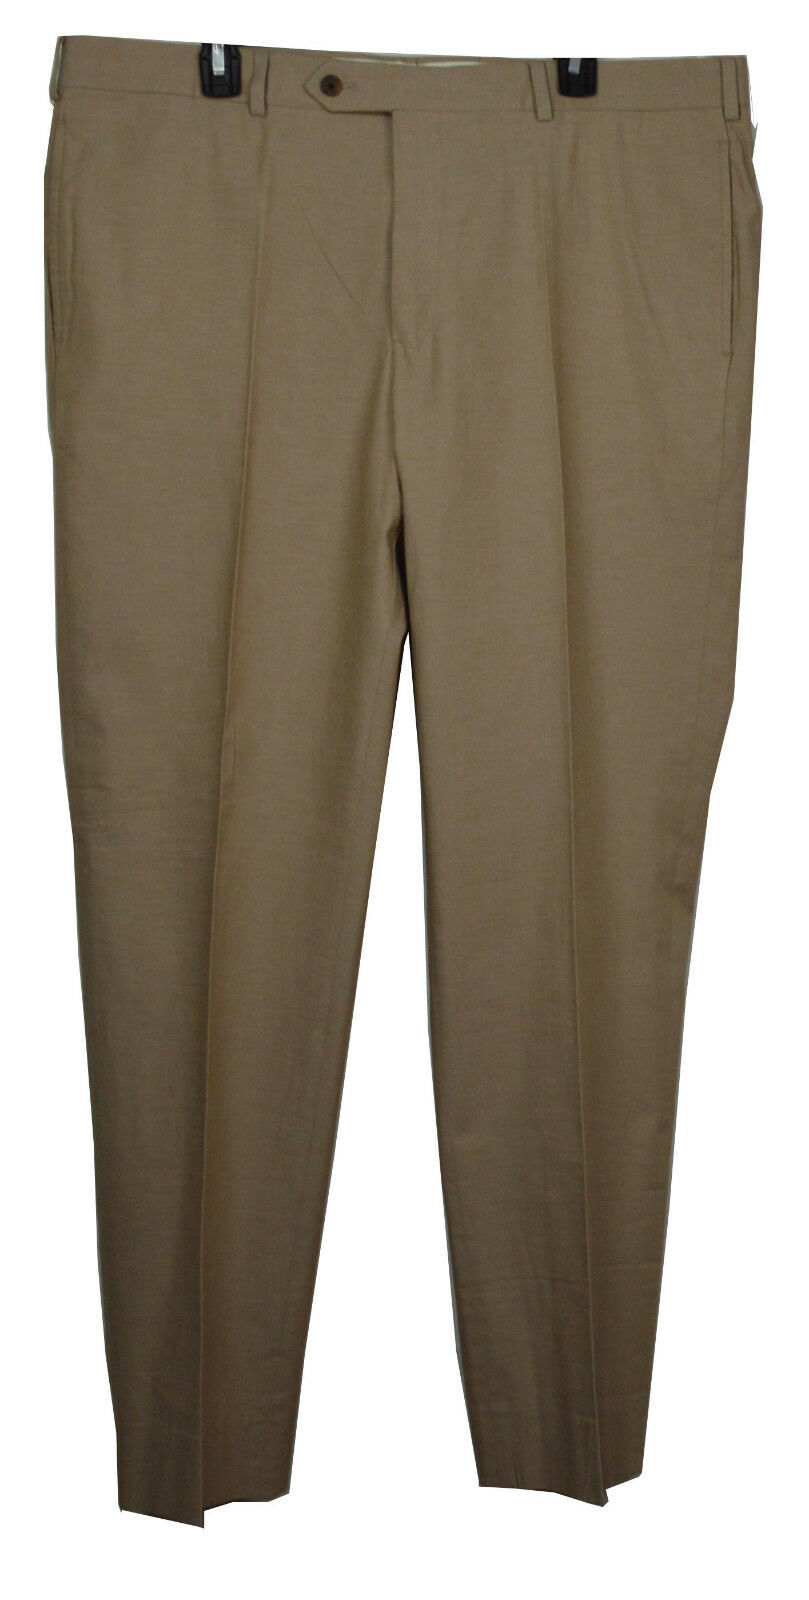 New Brooks Bredhers Men Regent Fit Solid Size 38x34 Beige Cotton Trousers 5640-3